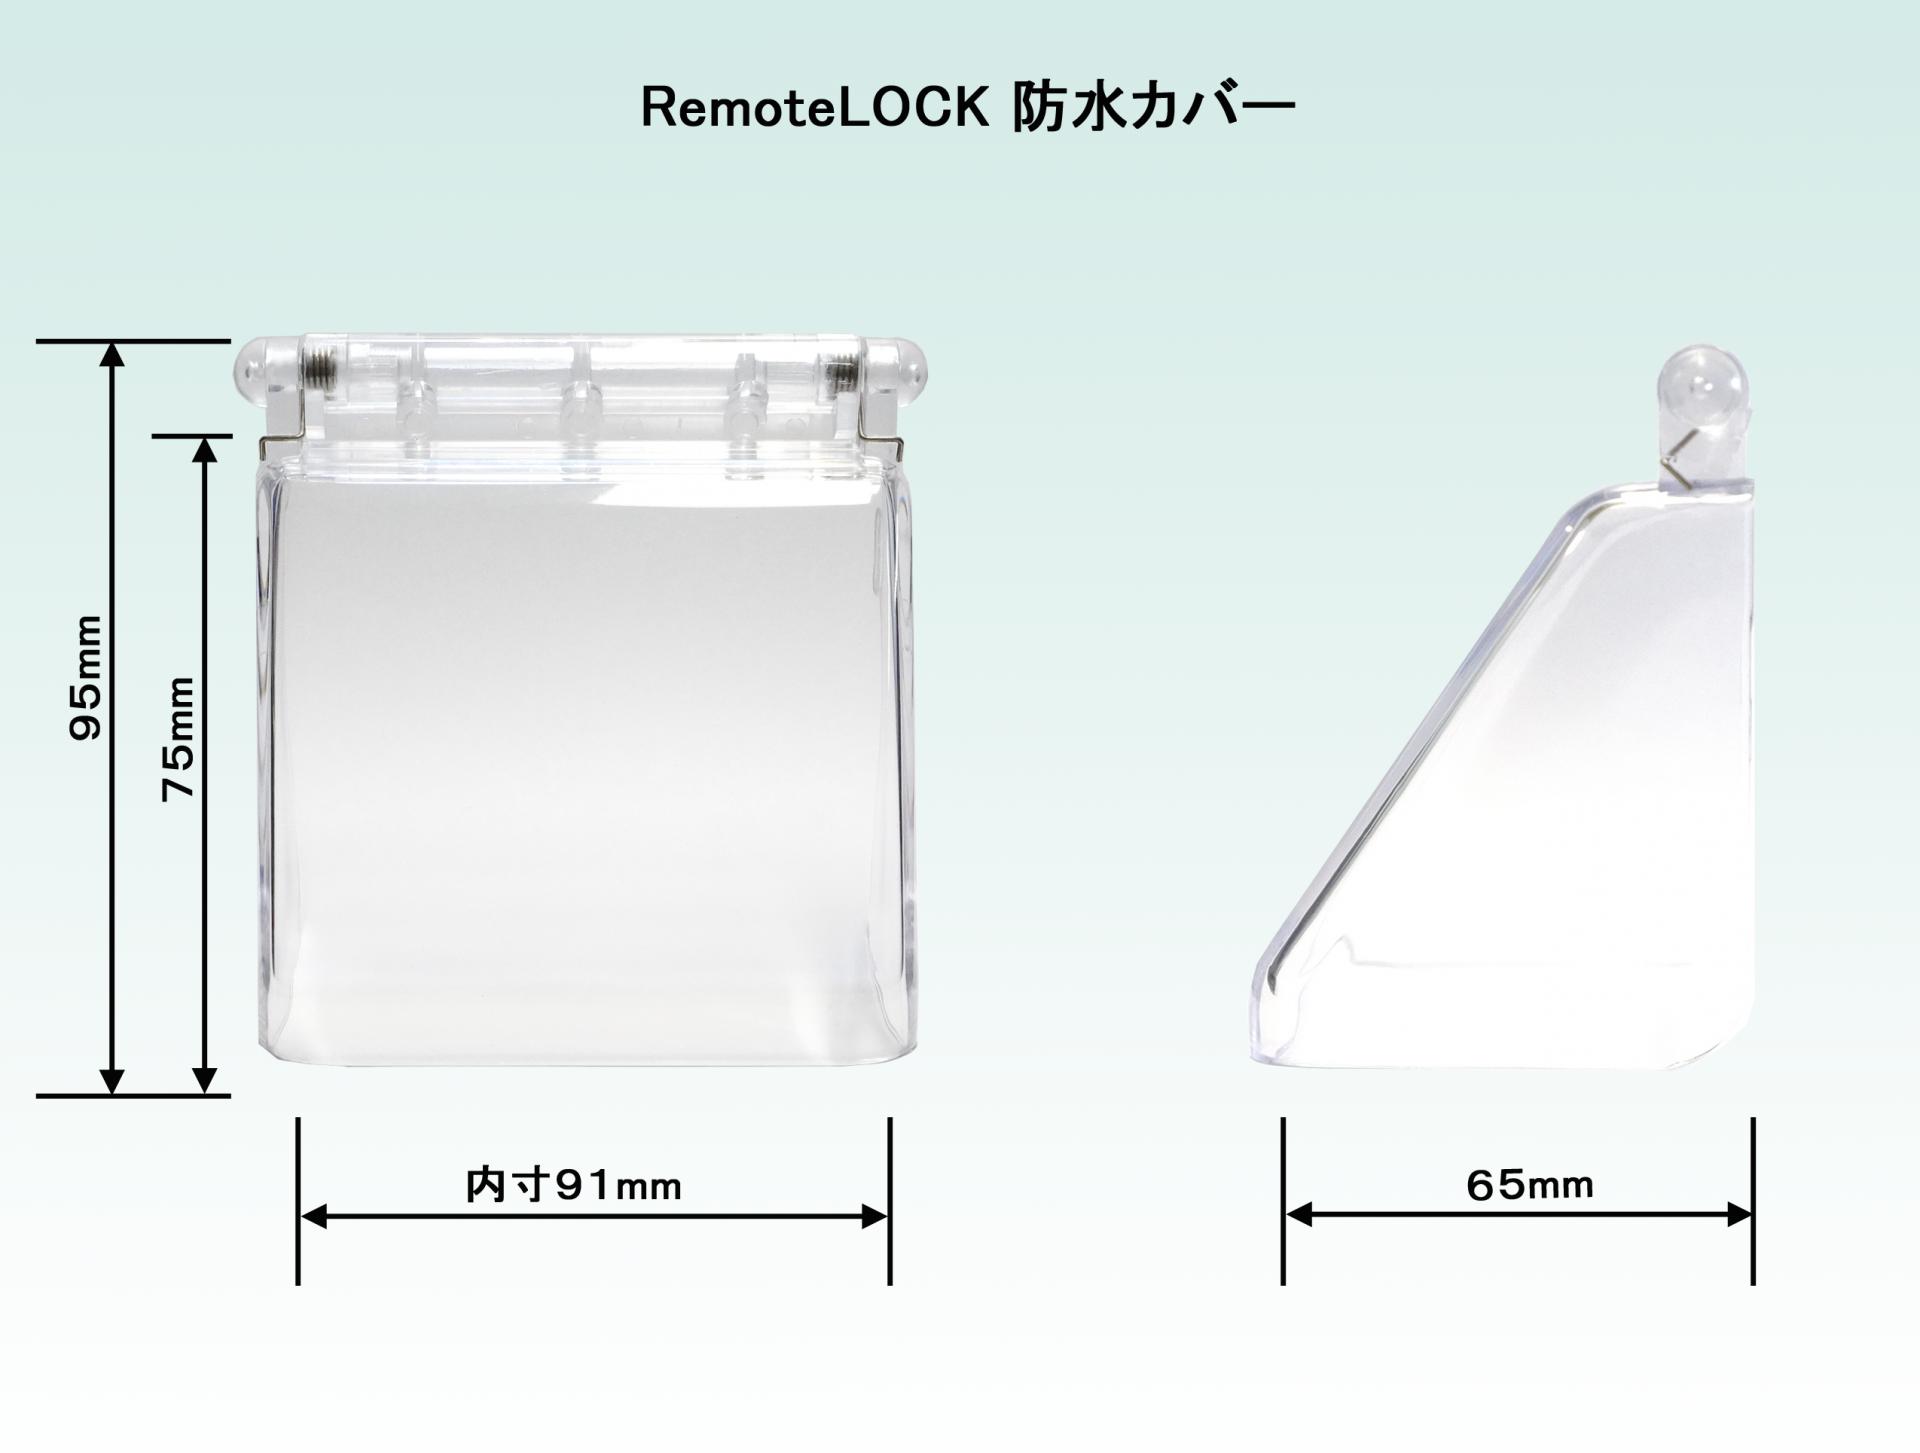 RemoteLOCK防水カバー